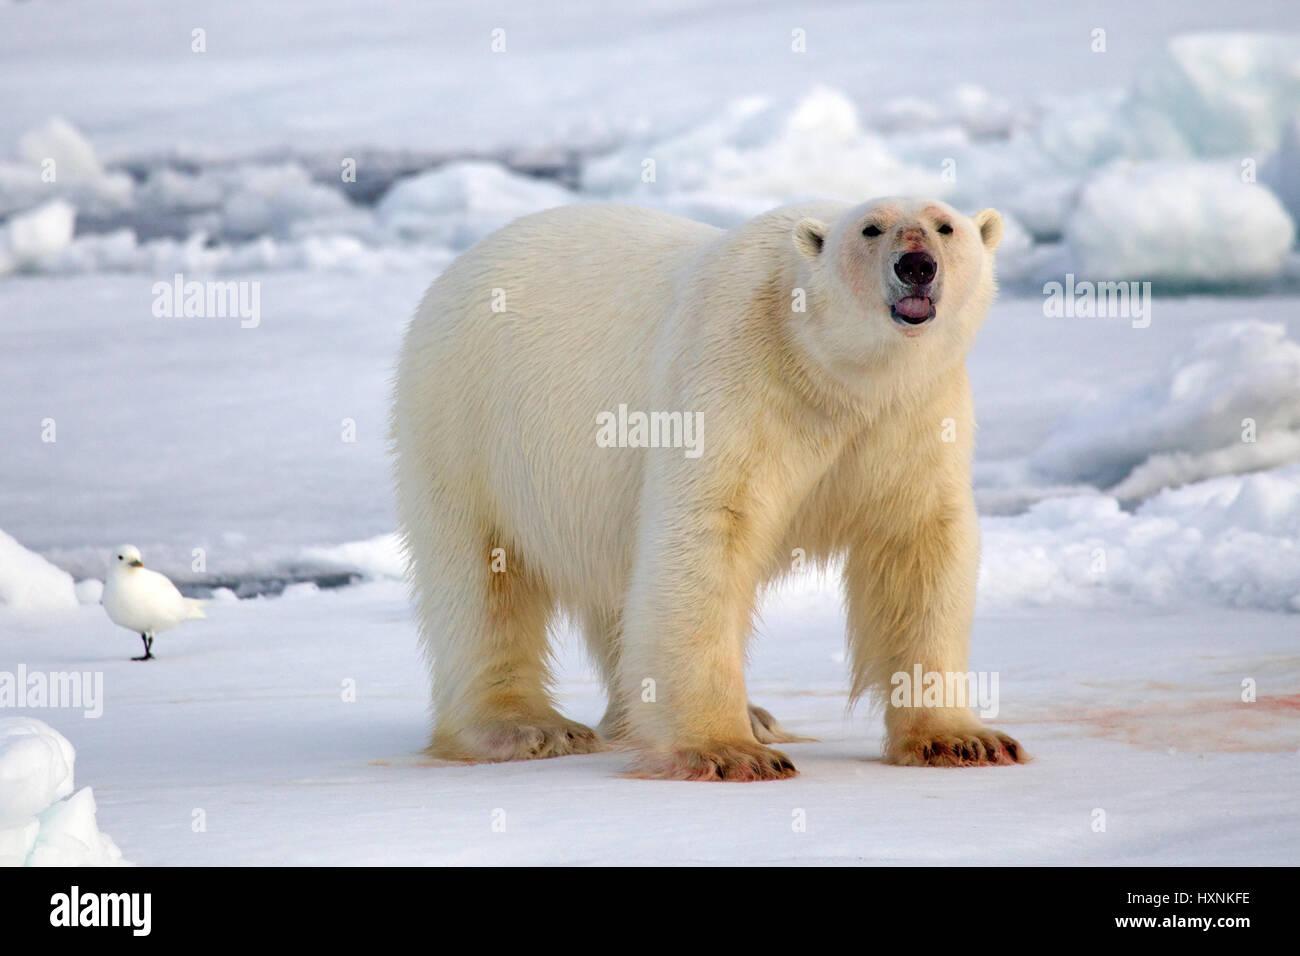 Polar bear with bloody paws, Eisbaer mit blutigen Tatzen Stock Photo